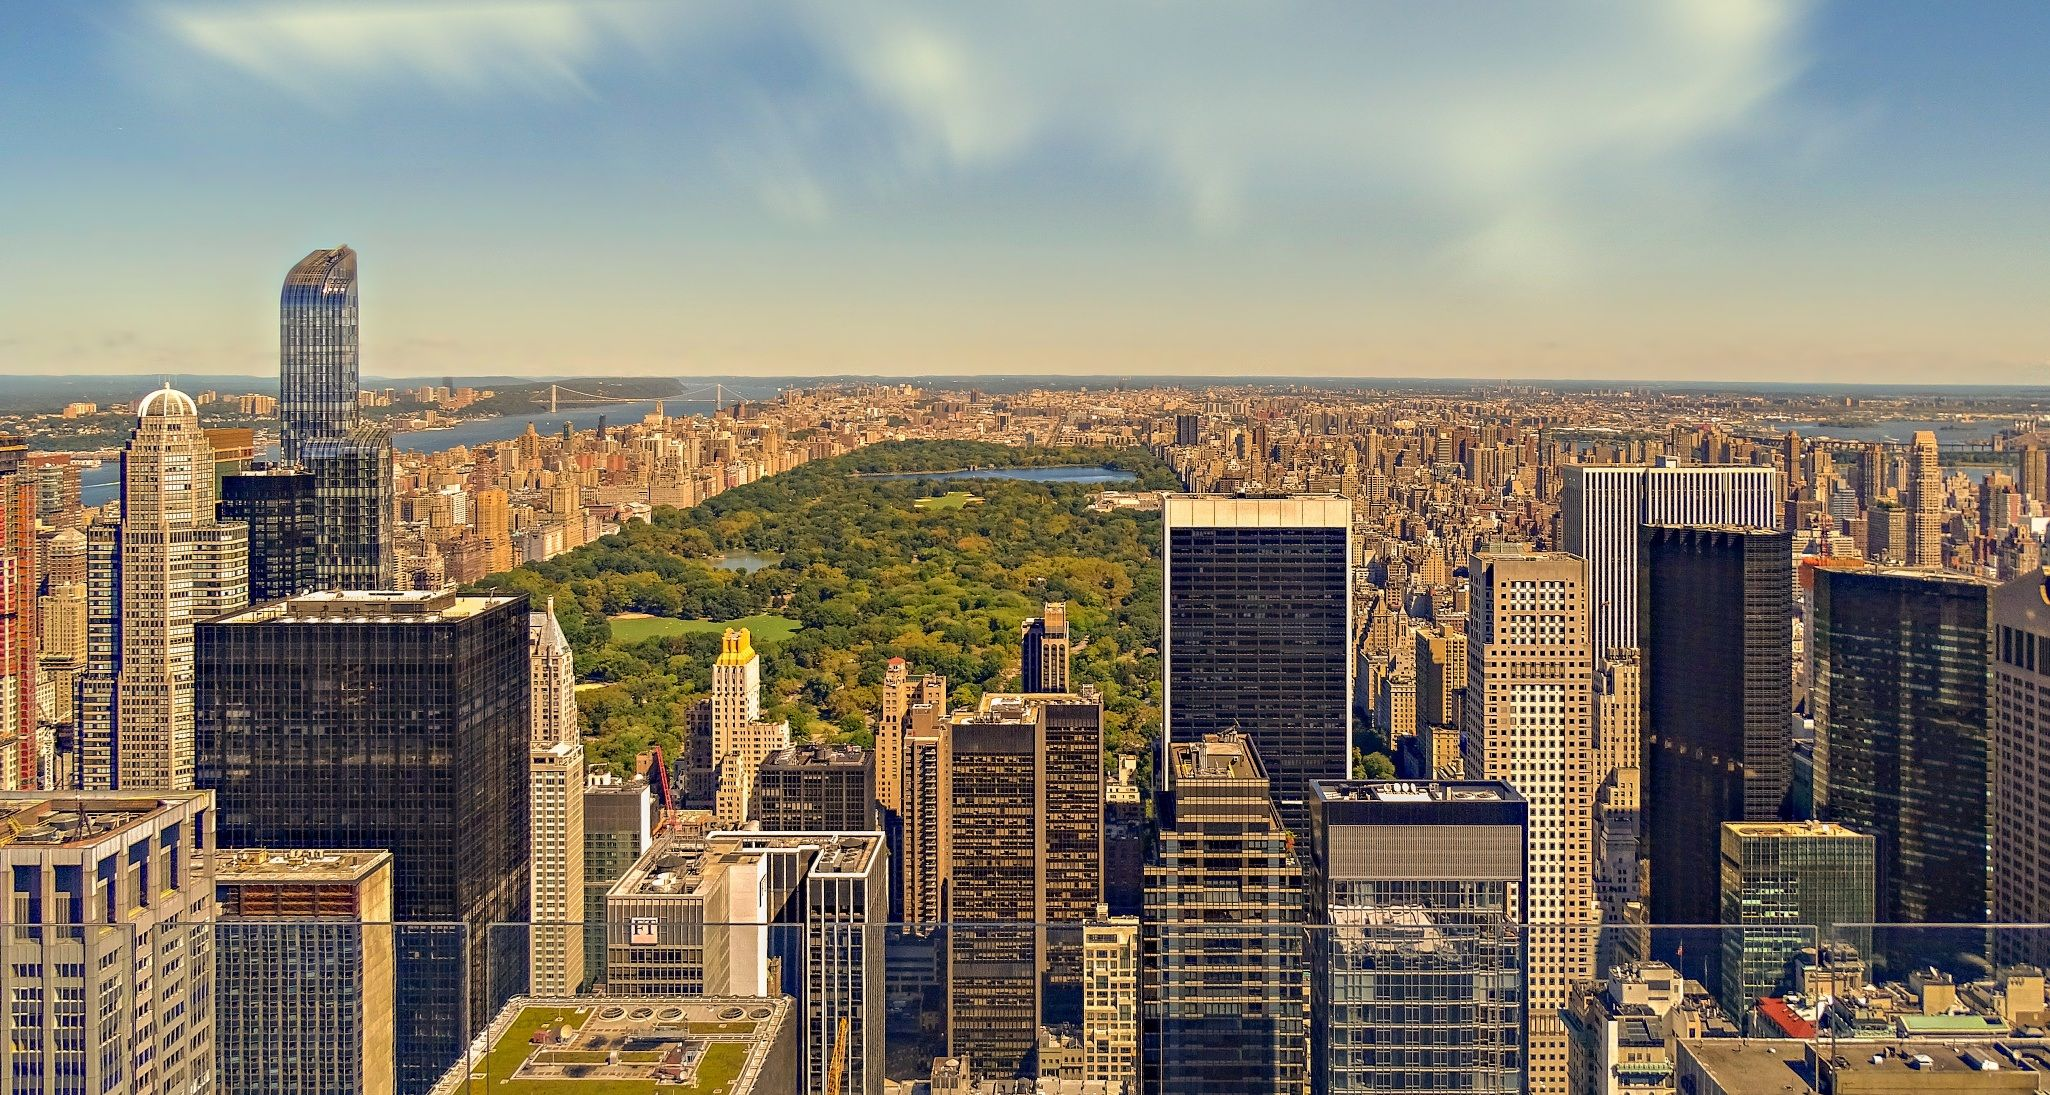 Como Mensurar Cidades Inteligentes?